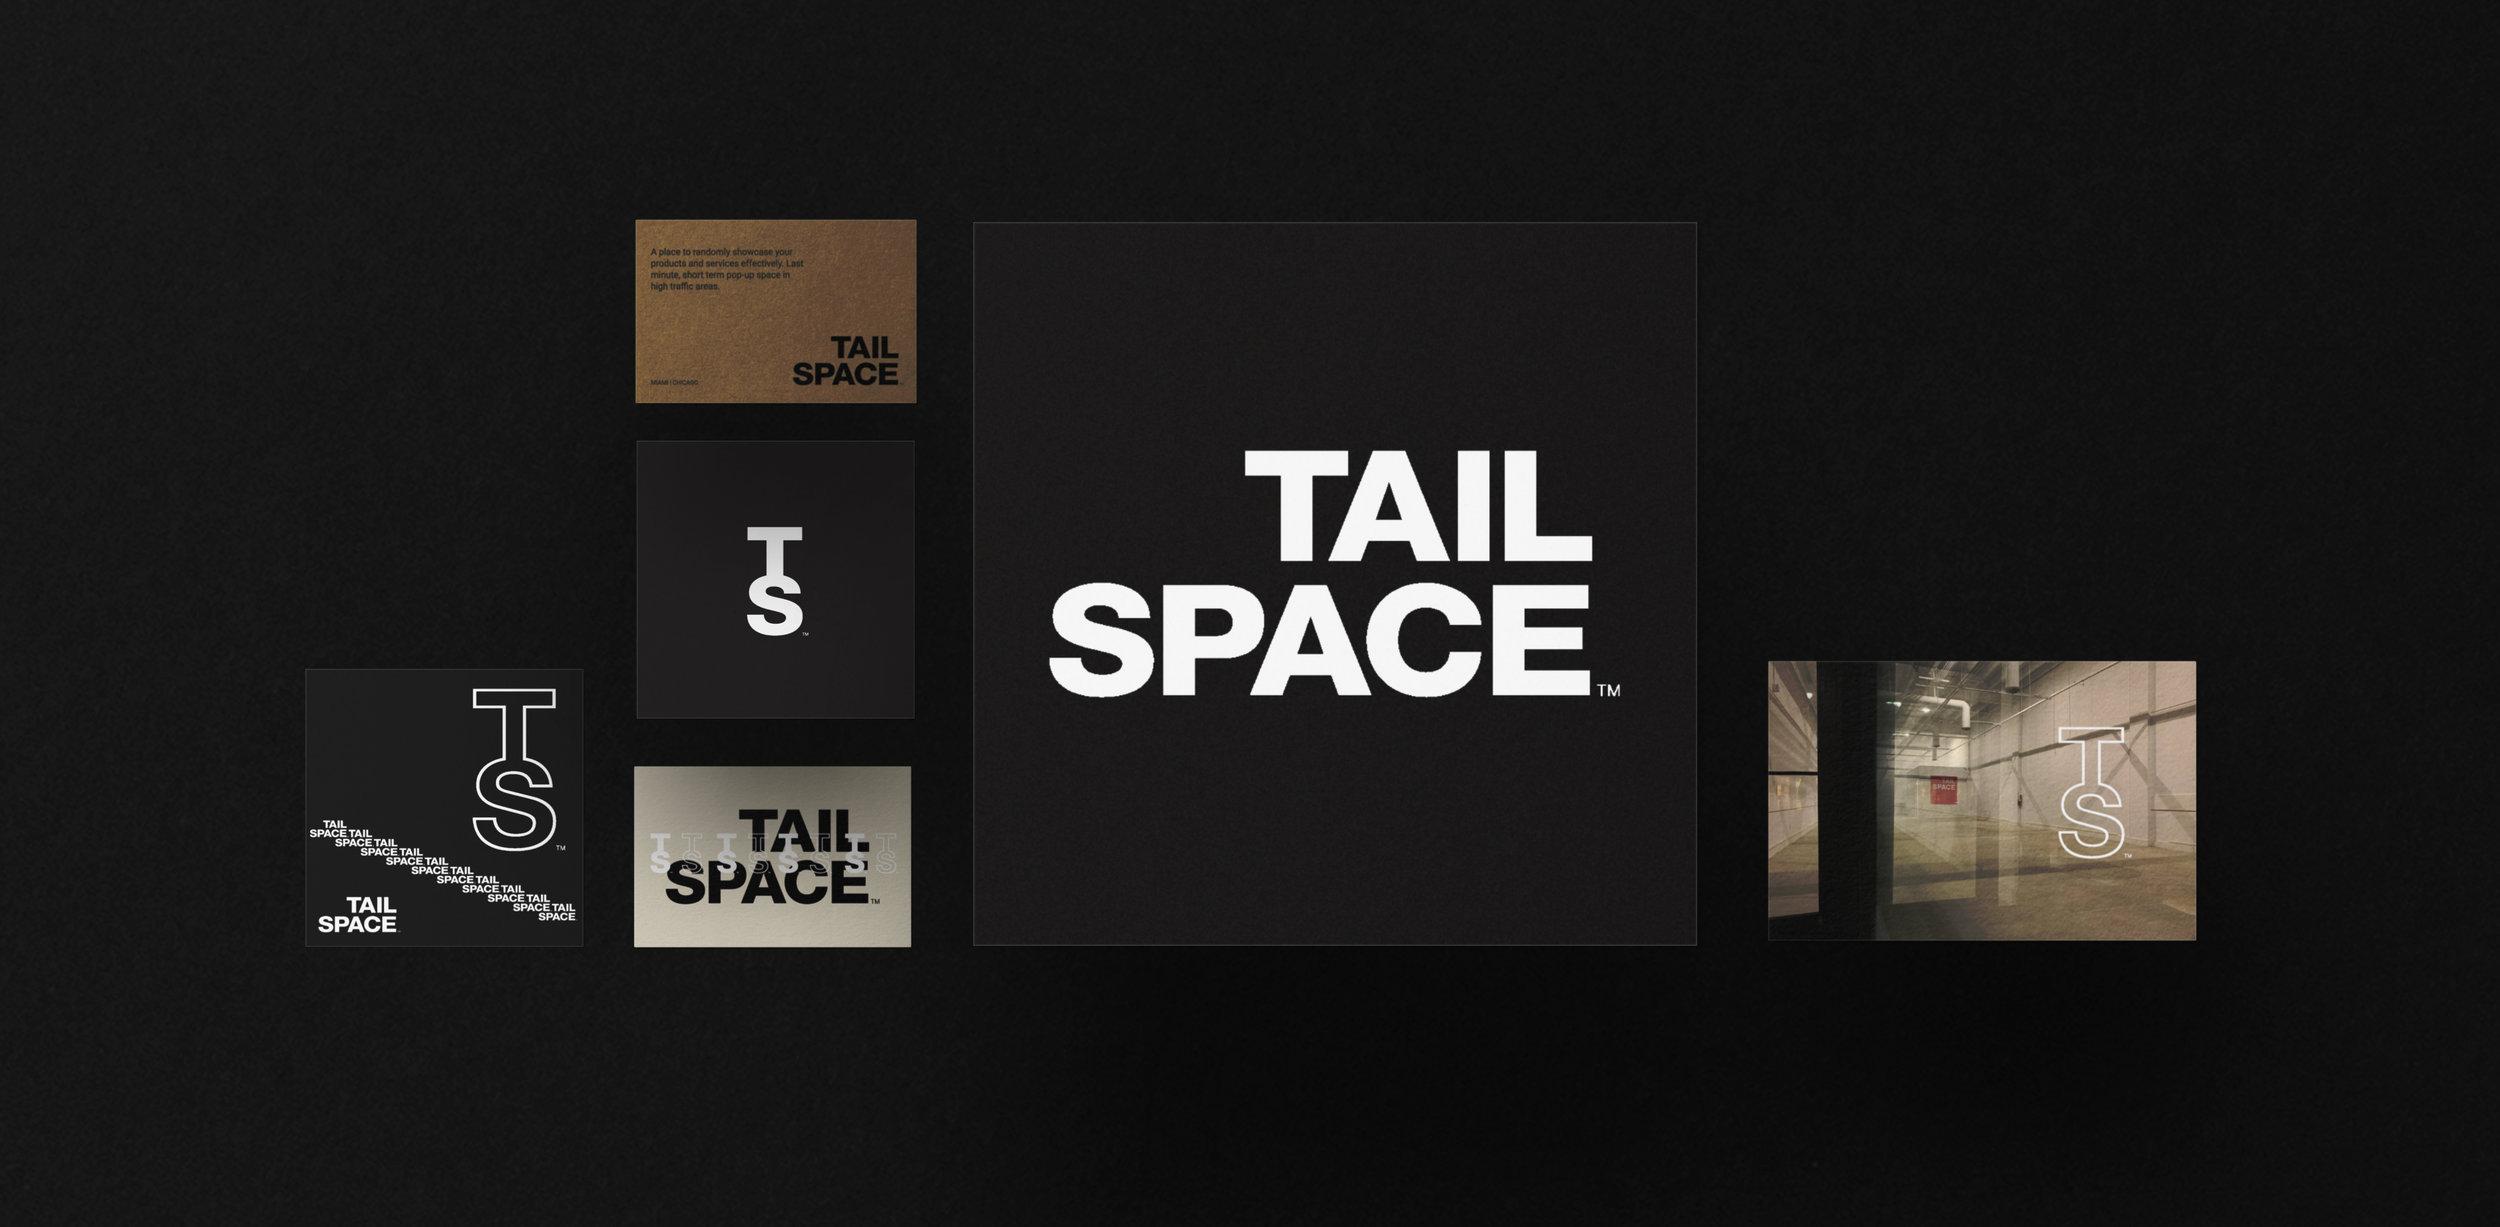 tail-space_set_4400w.jpeg